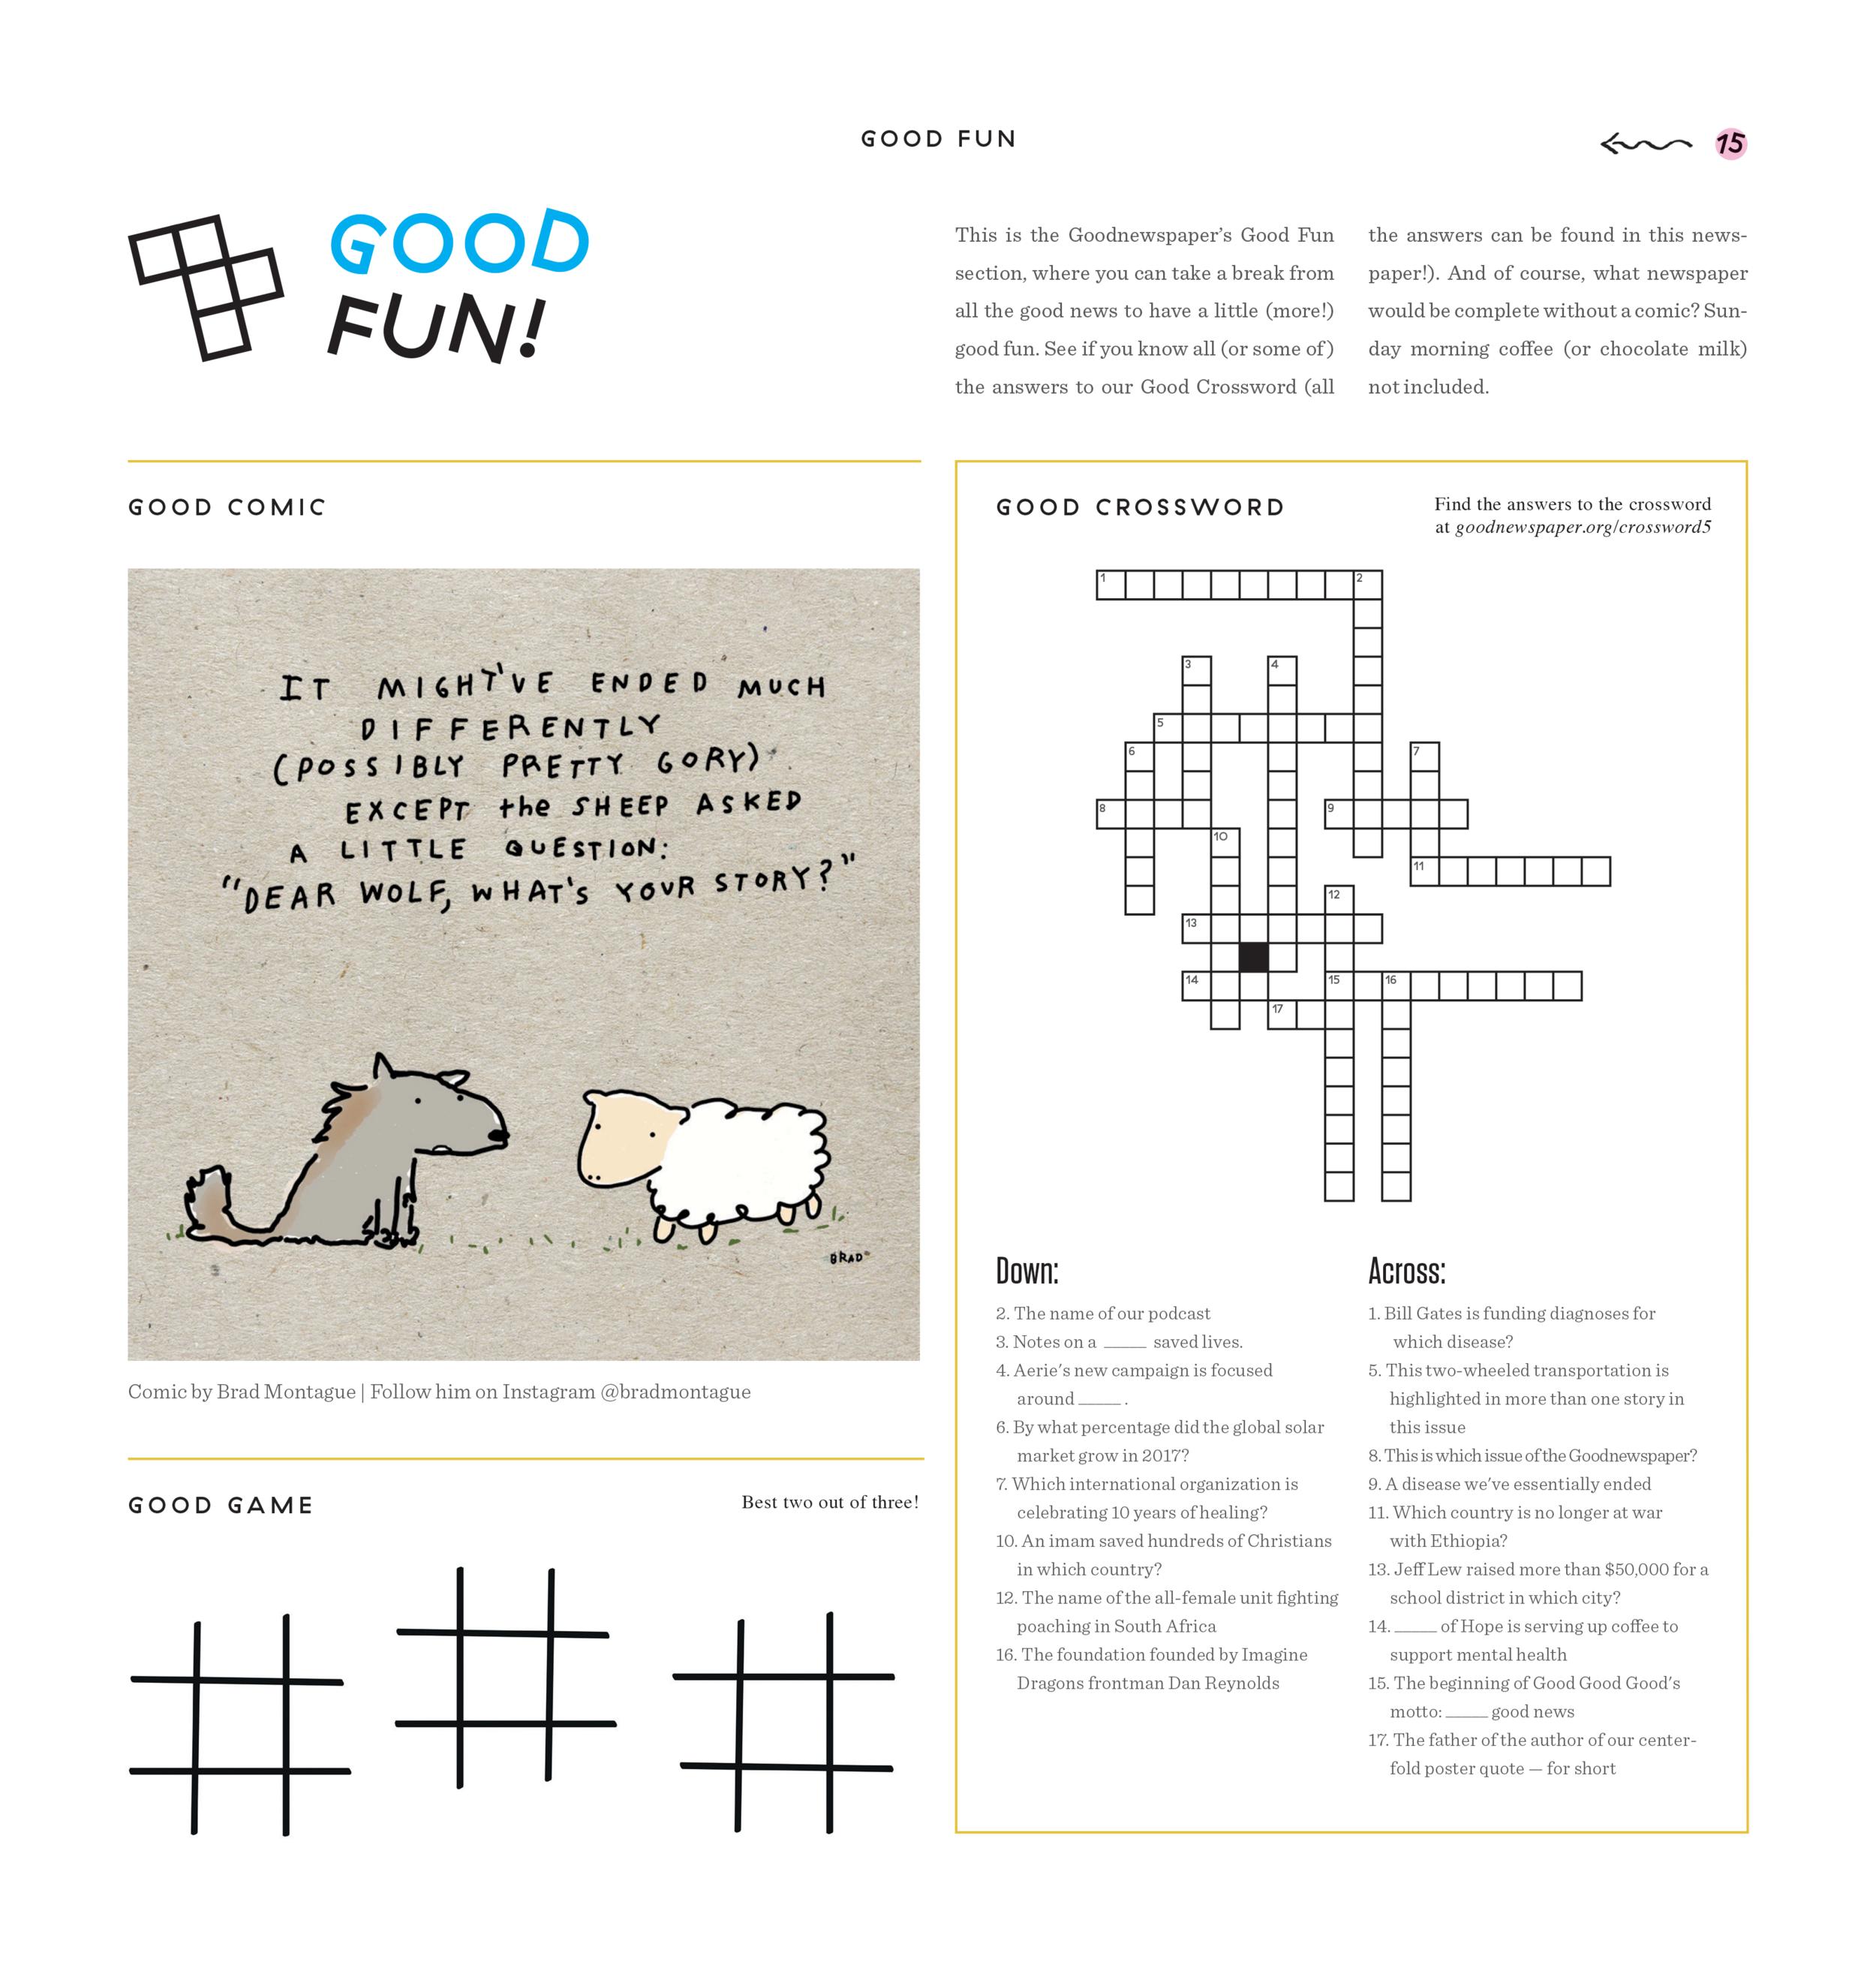 Goodnewspaper Crossword